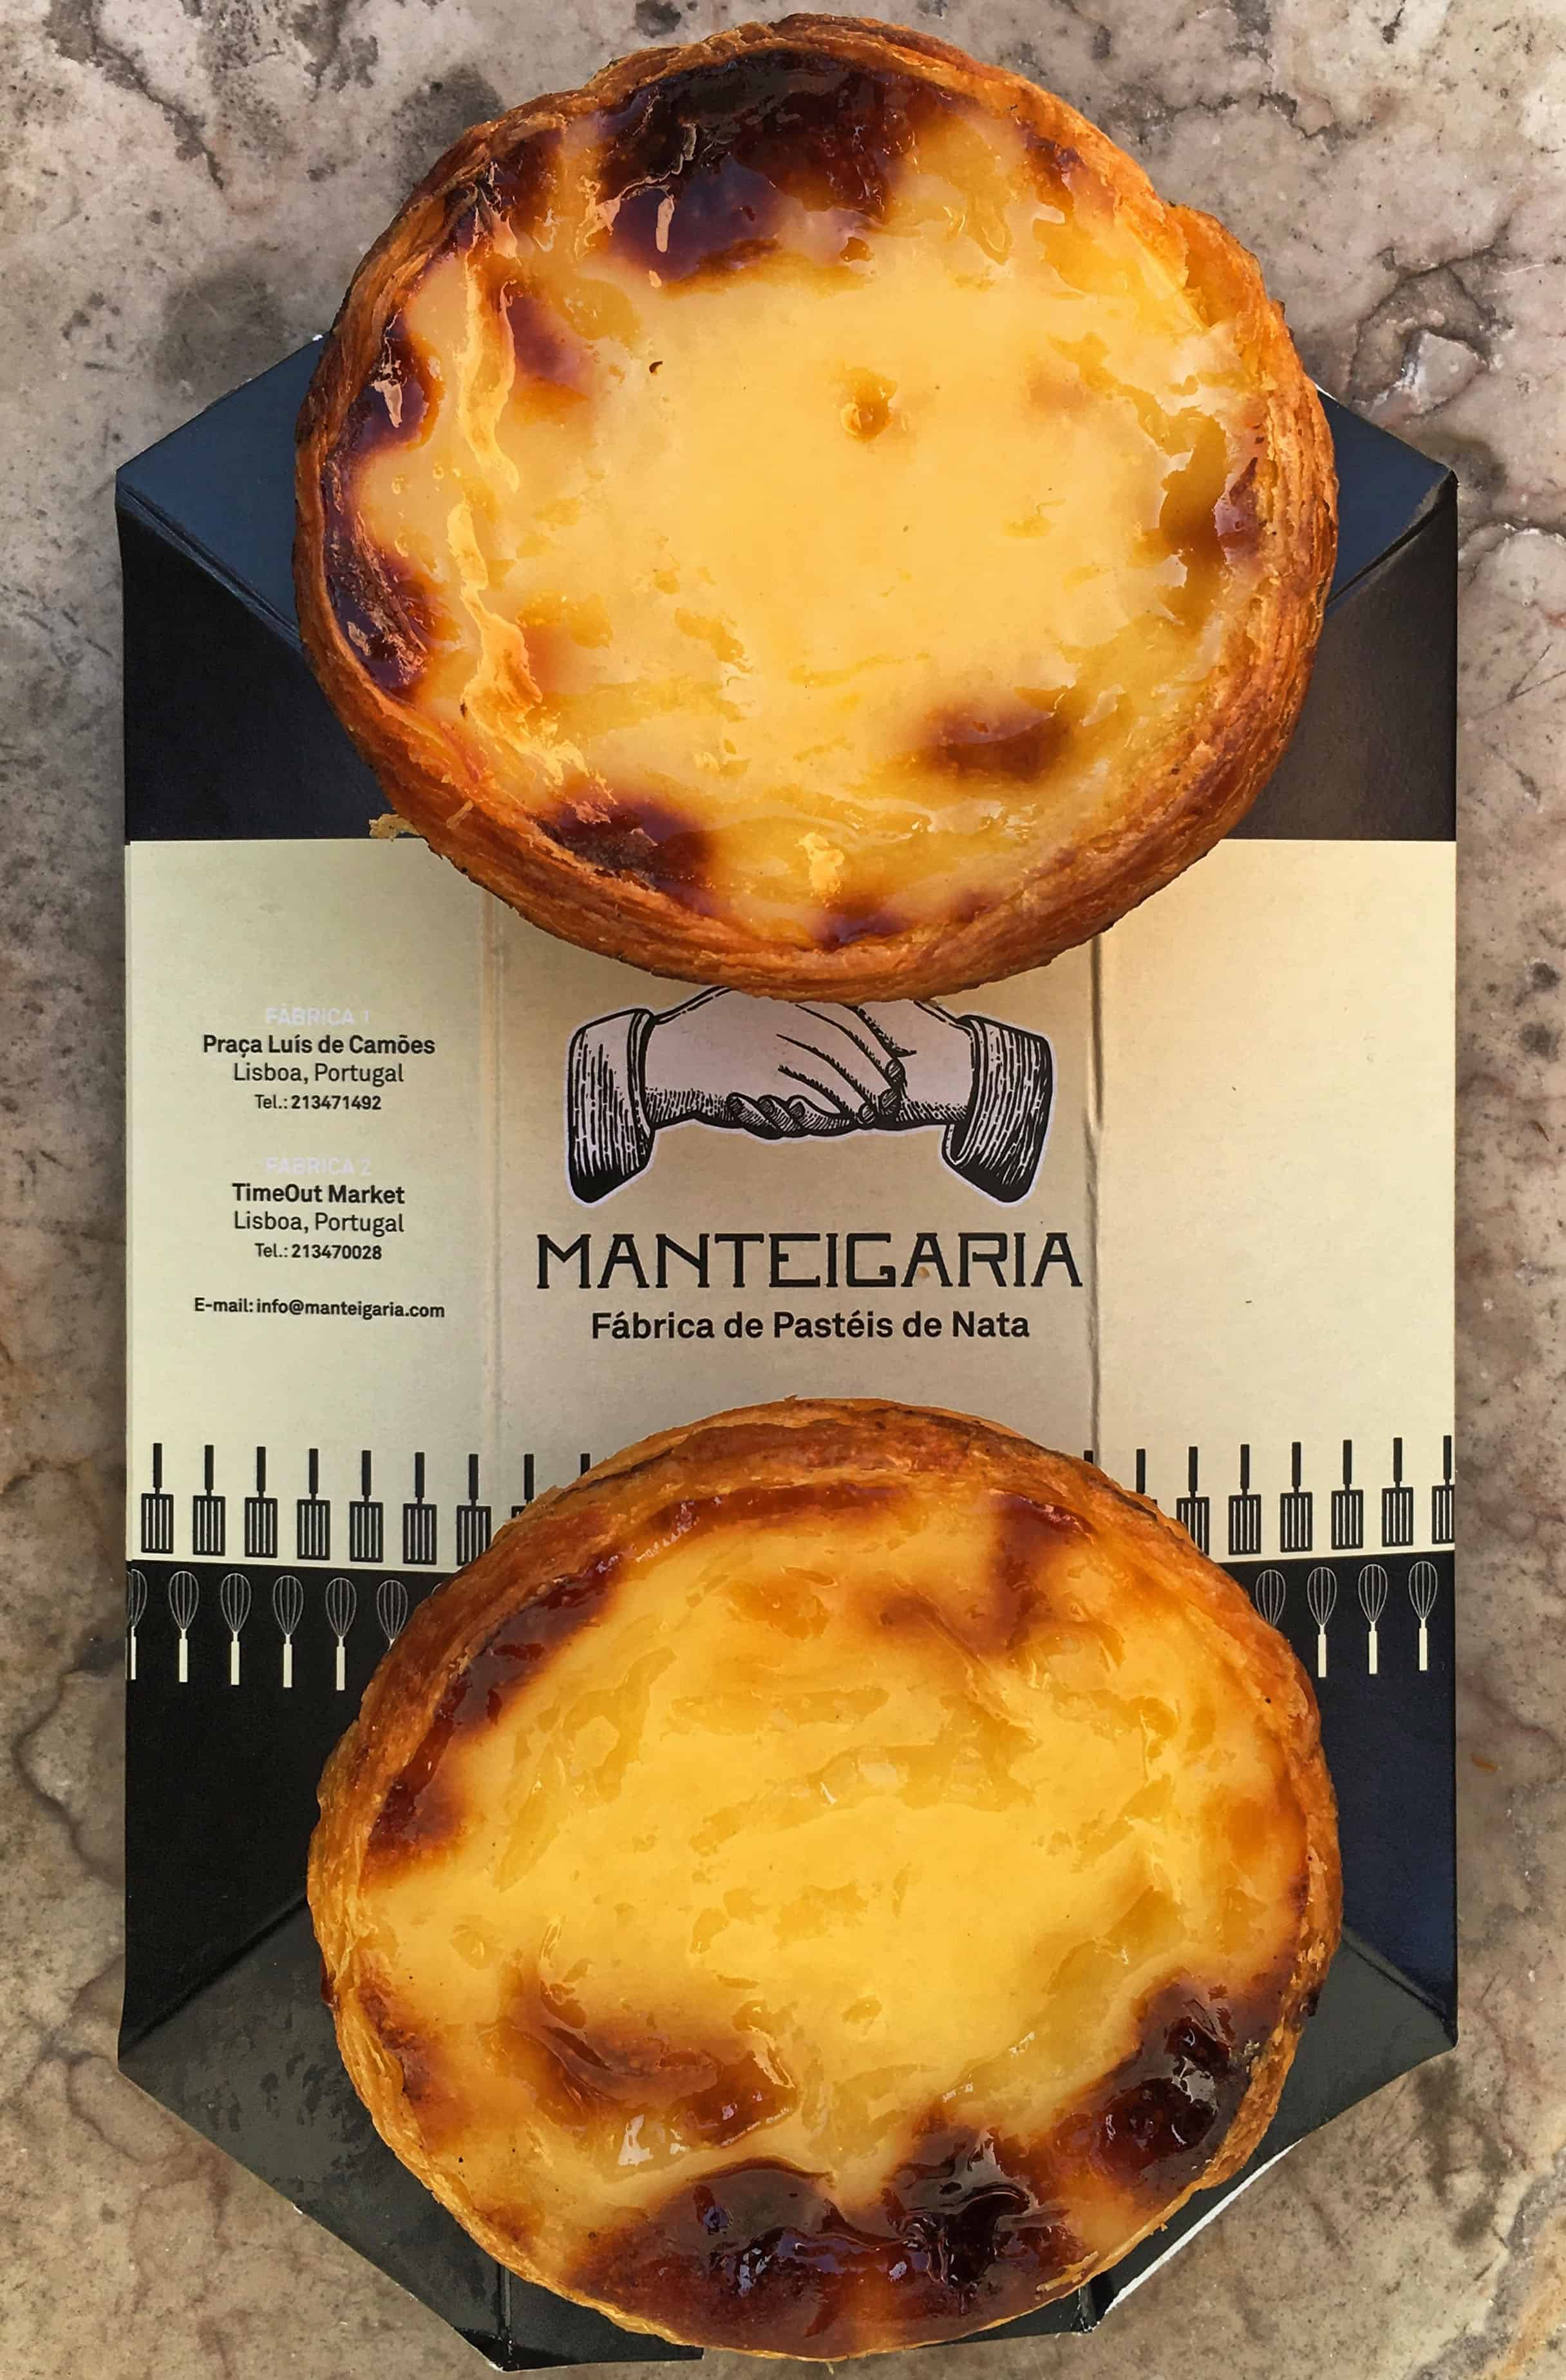 Manteigaria Pastéis de Nata